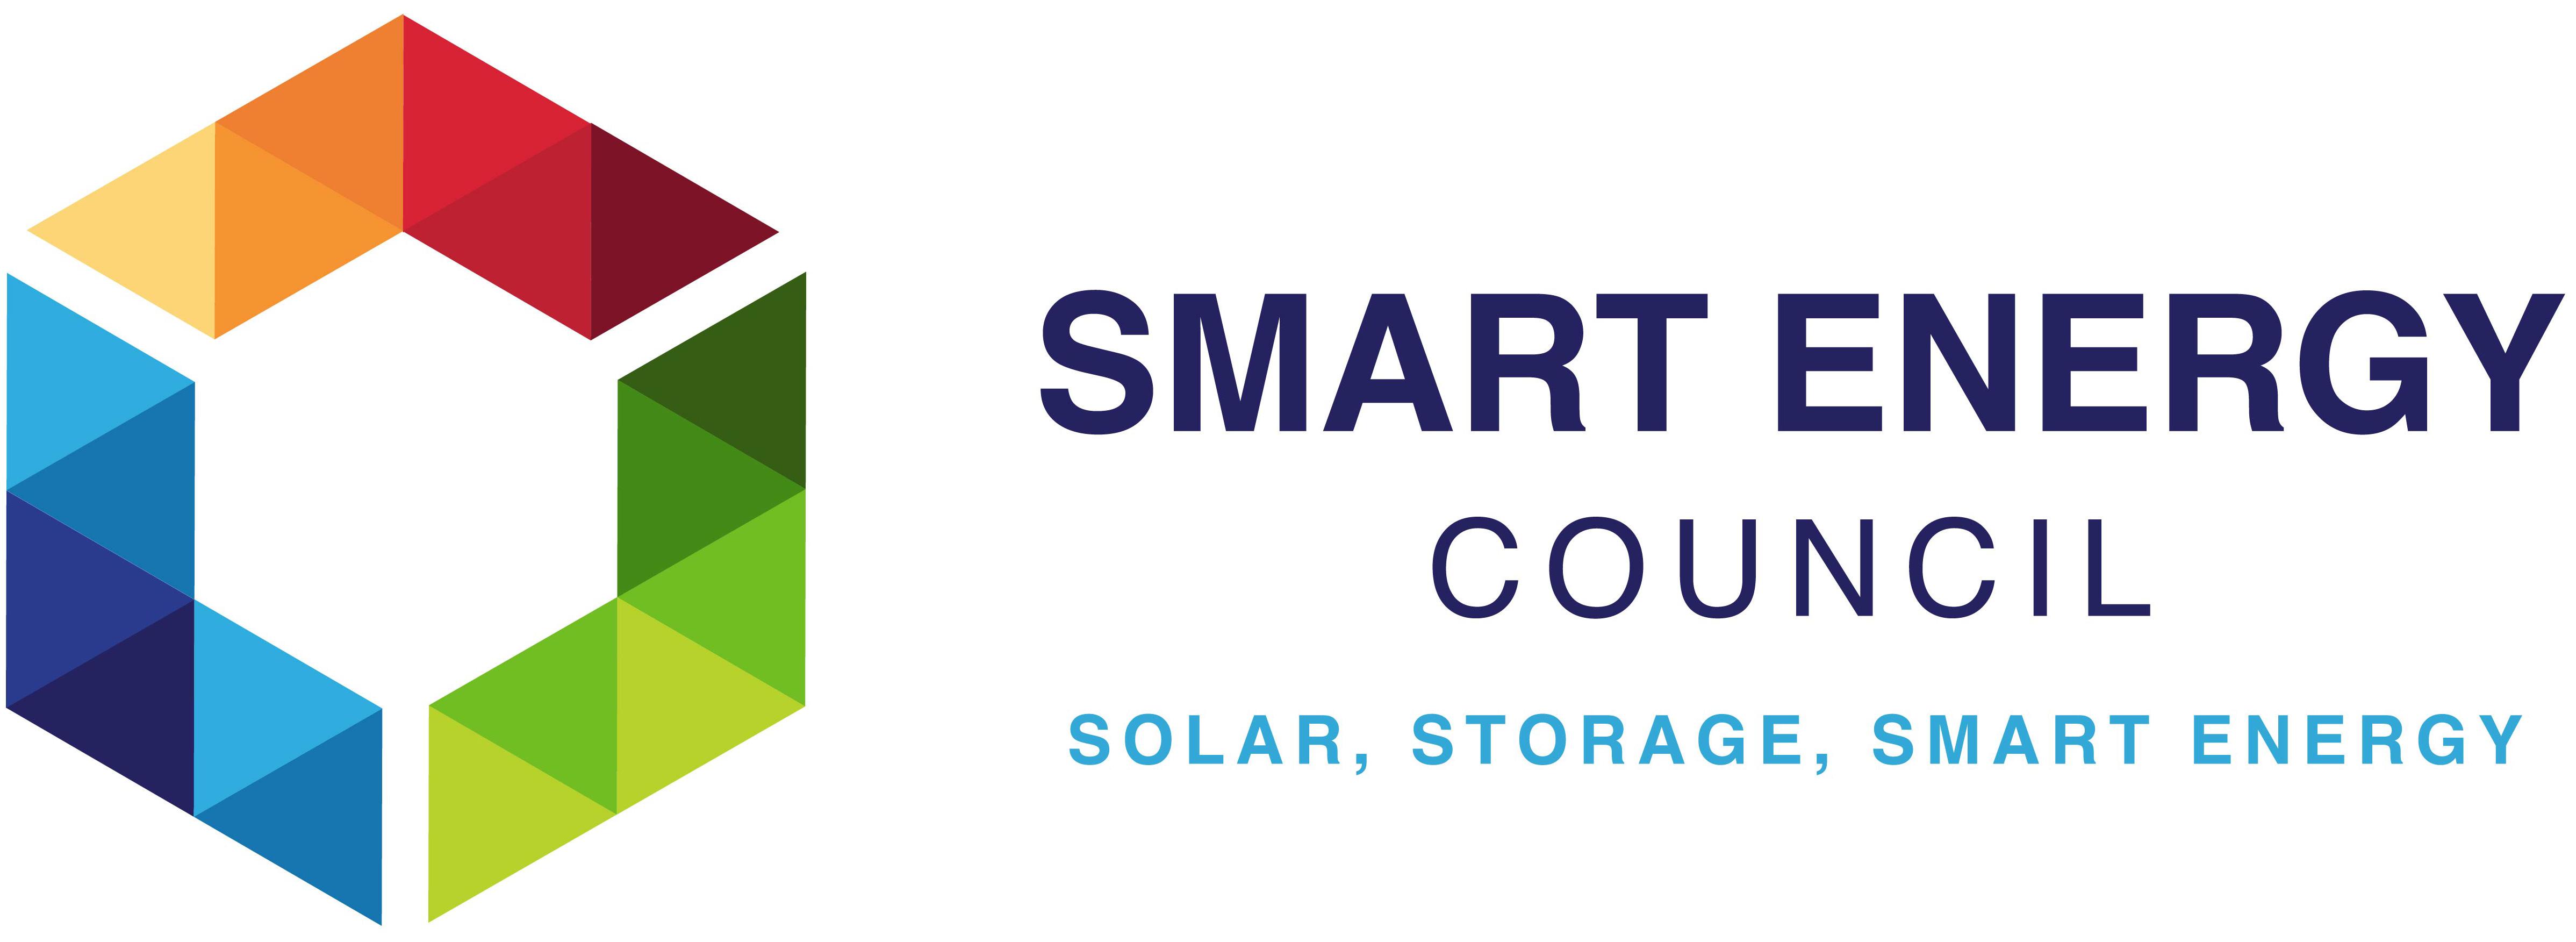 Smart energy council logo